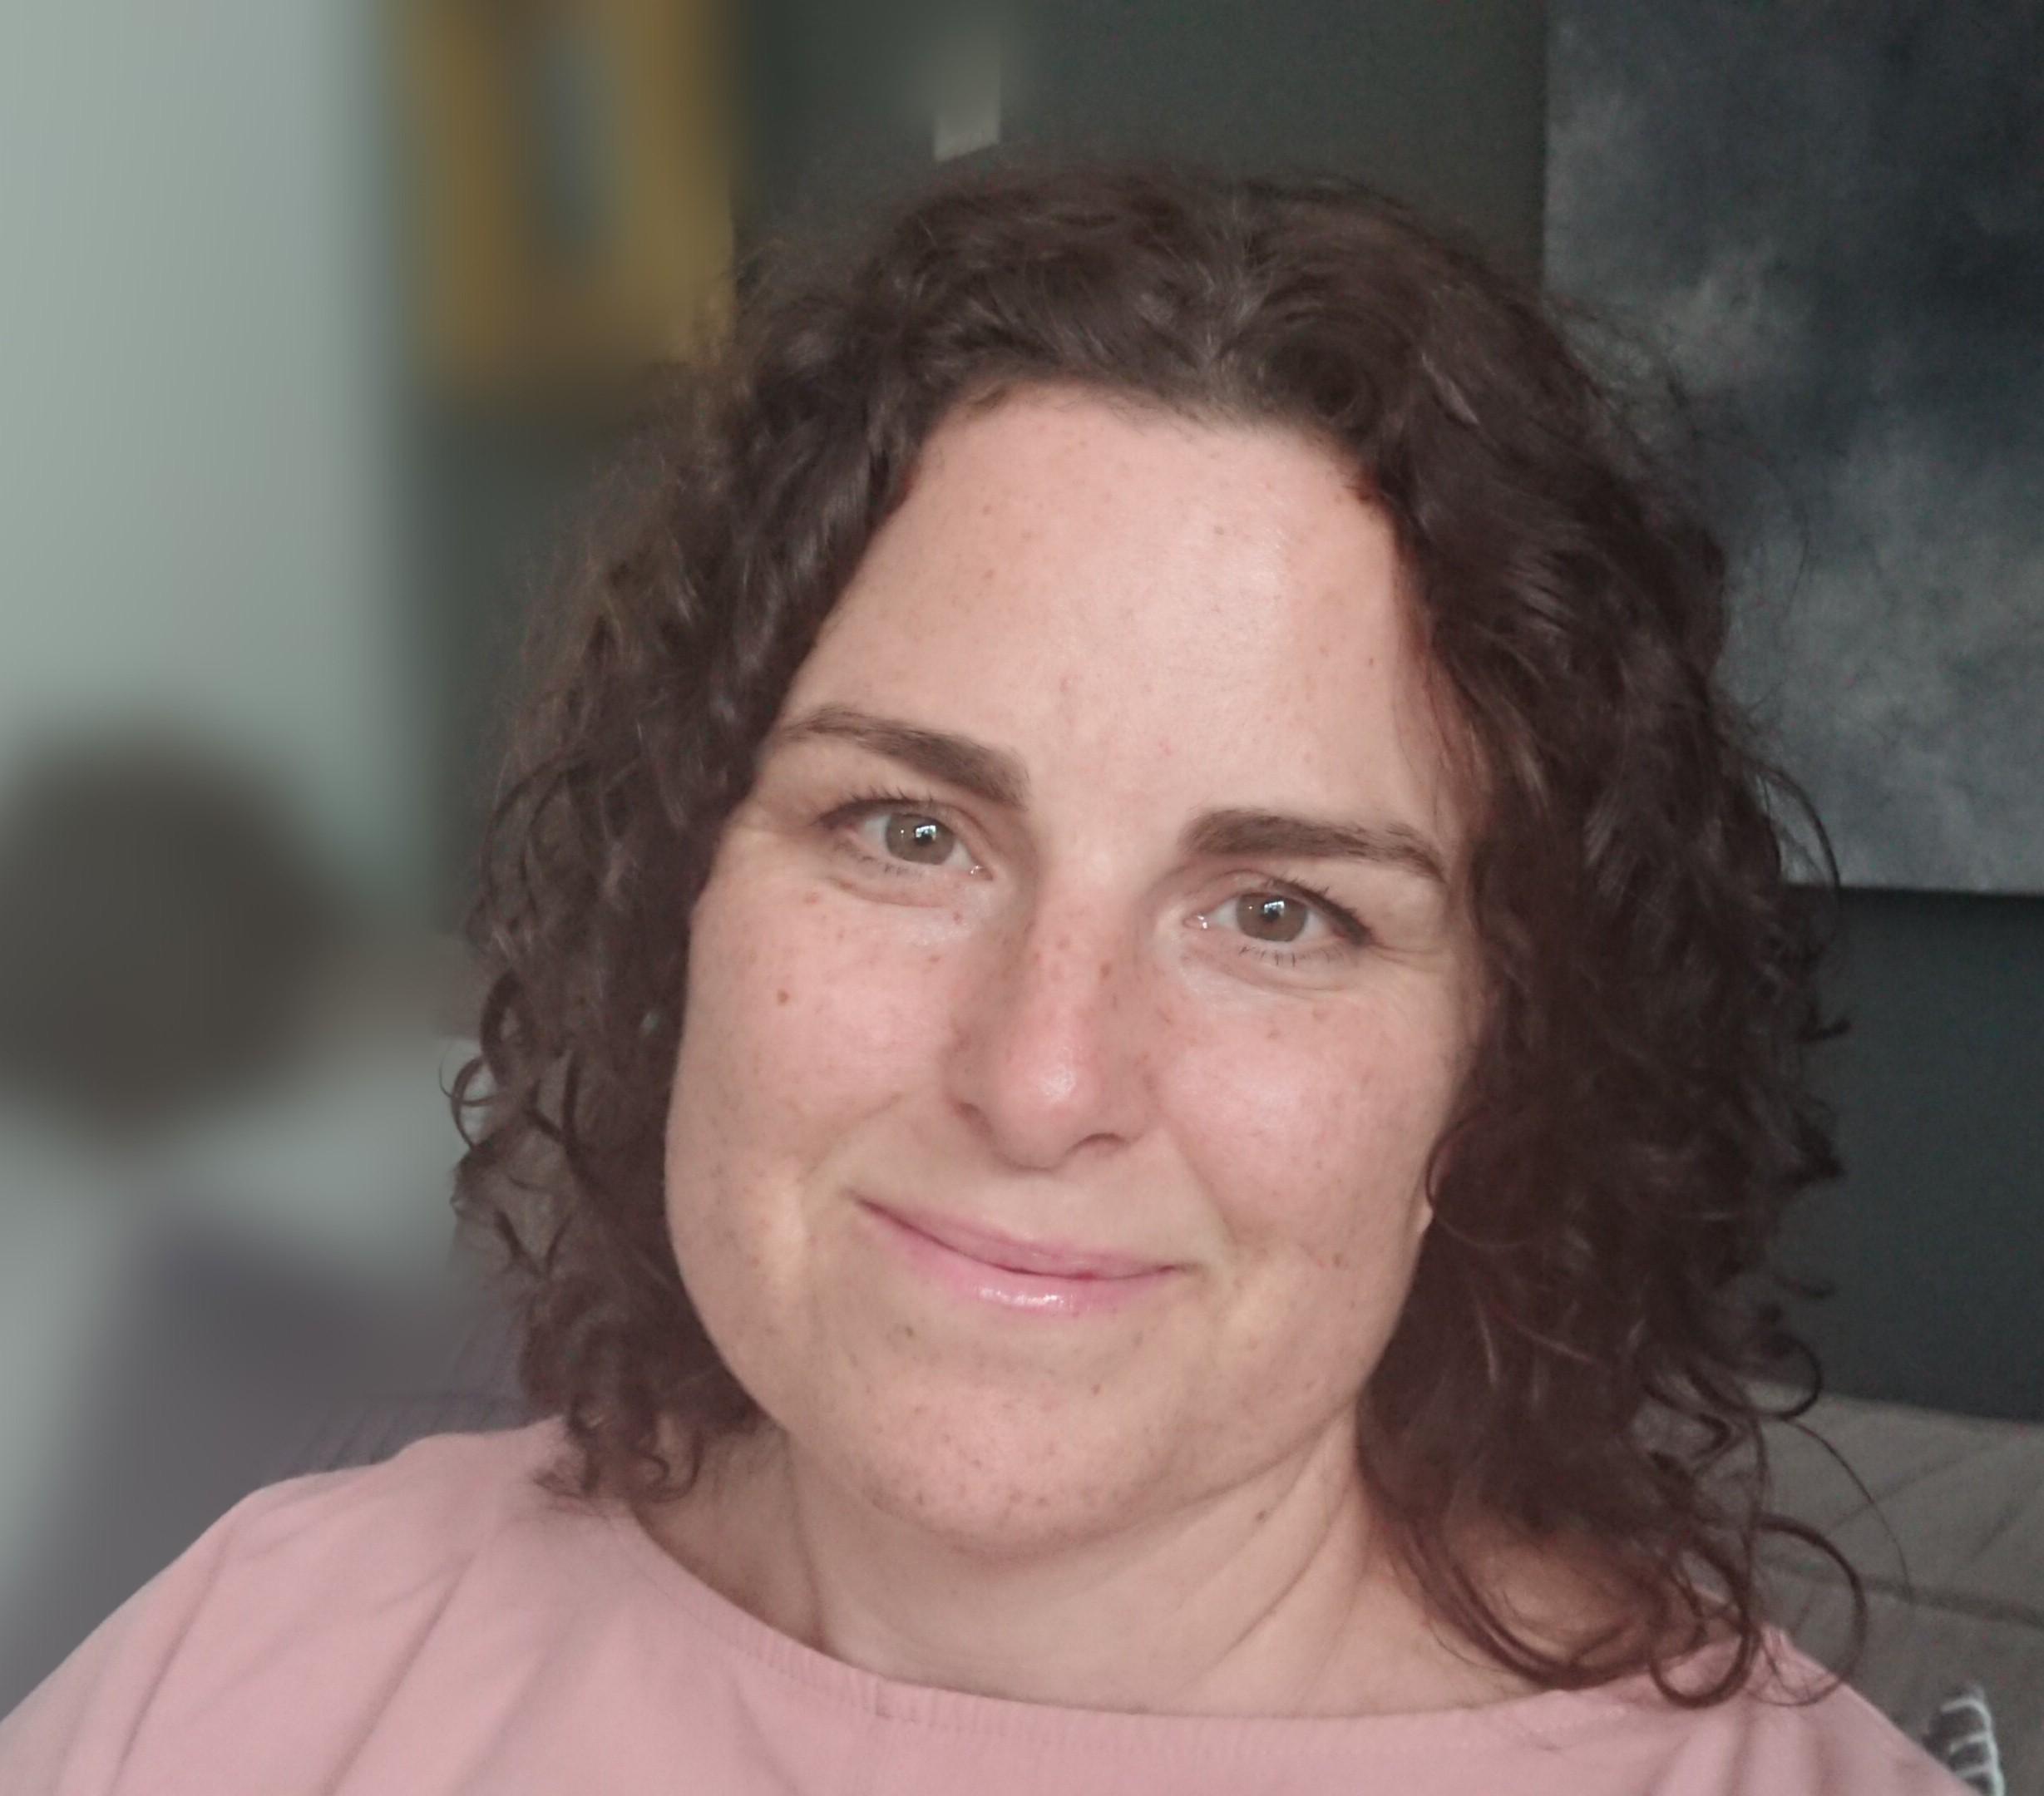 Gemma Luther